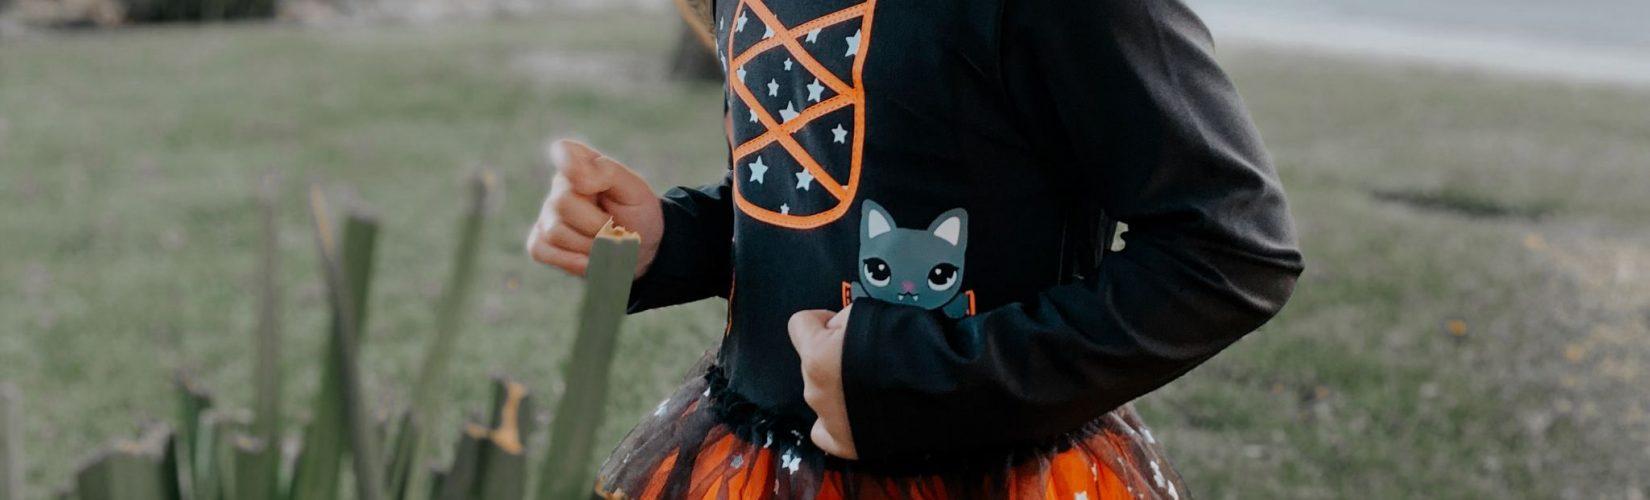 8 Halloween Safety Tips